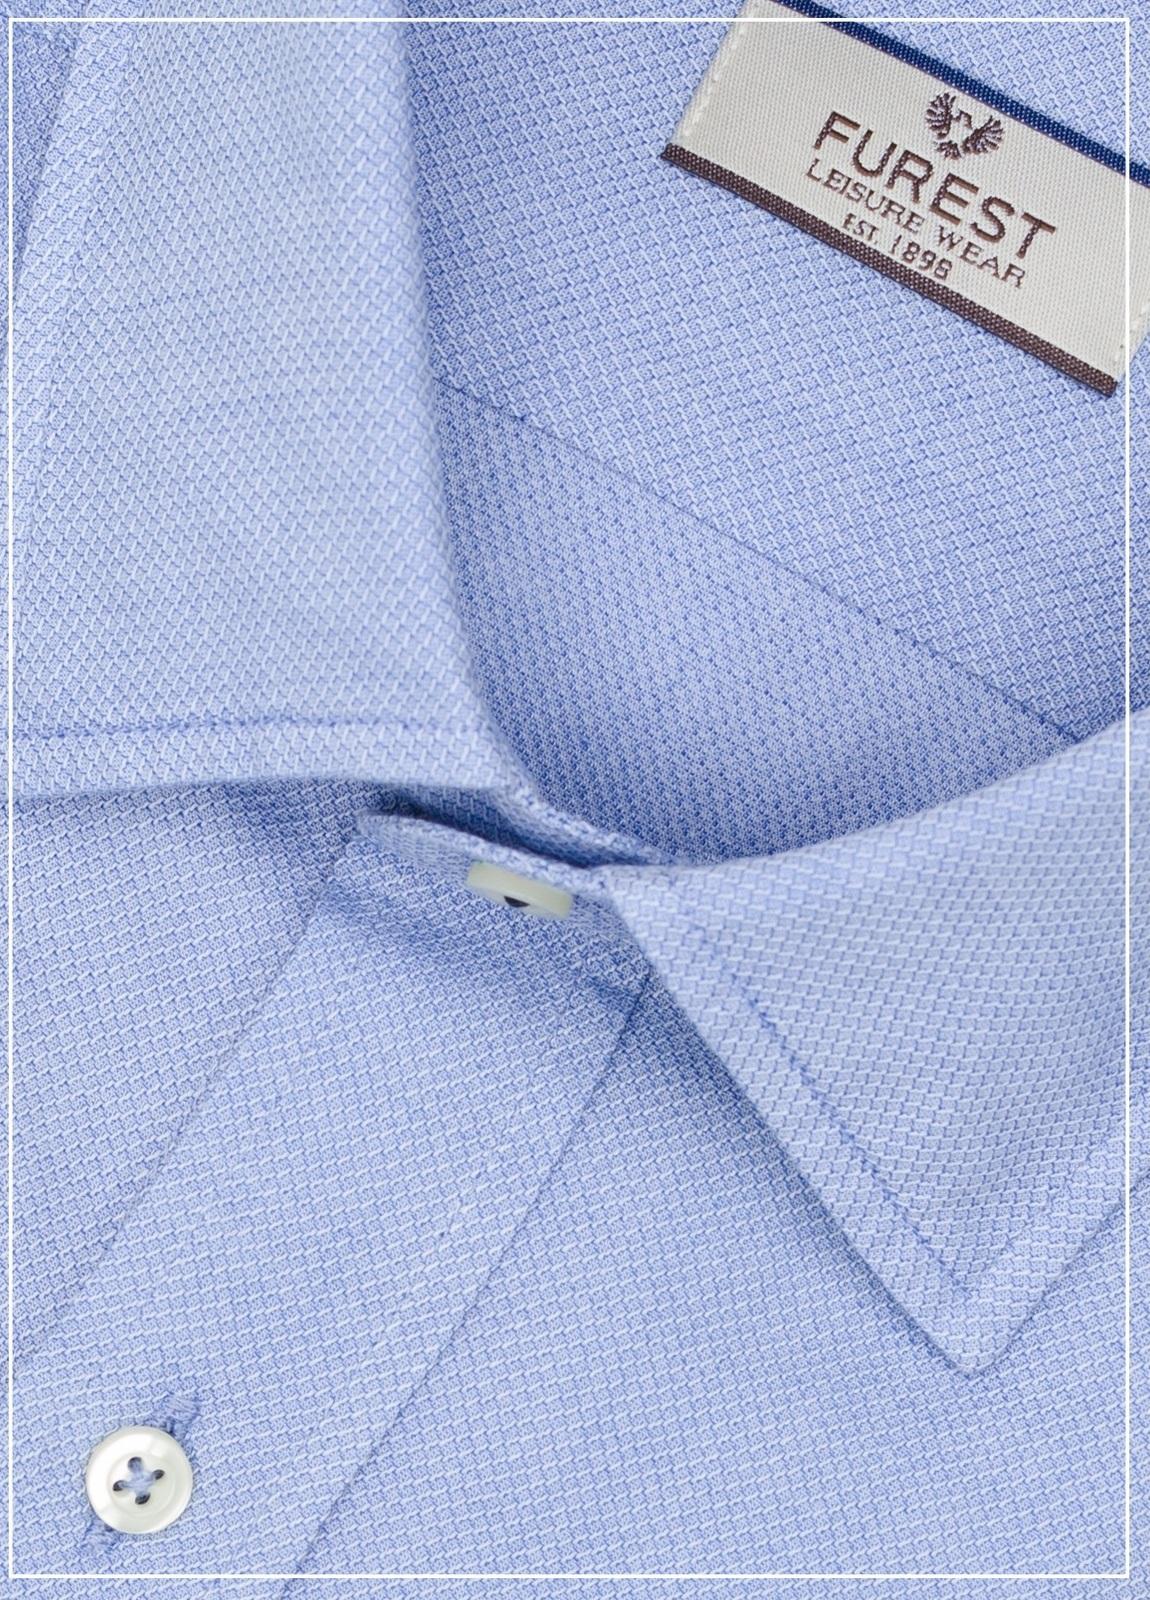 Camisa Leisure Wear REGULAR FIT modelo PORTO lisa color azul 100% Algodón. - Ítem1